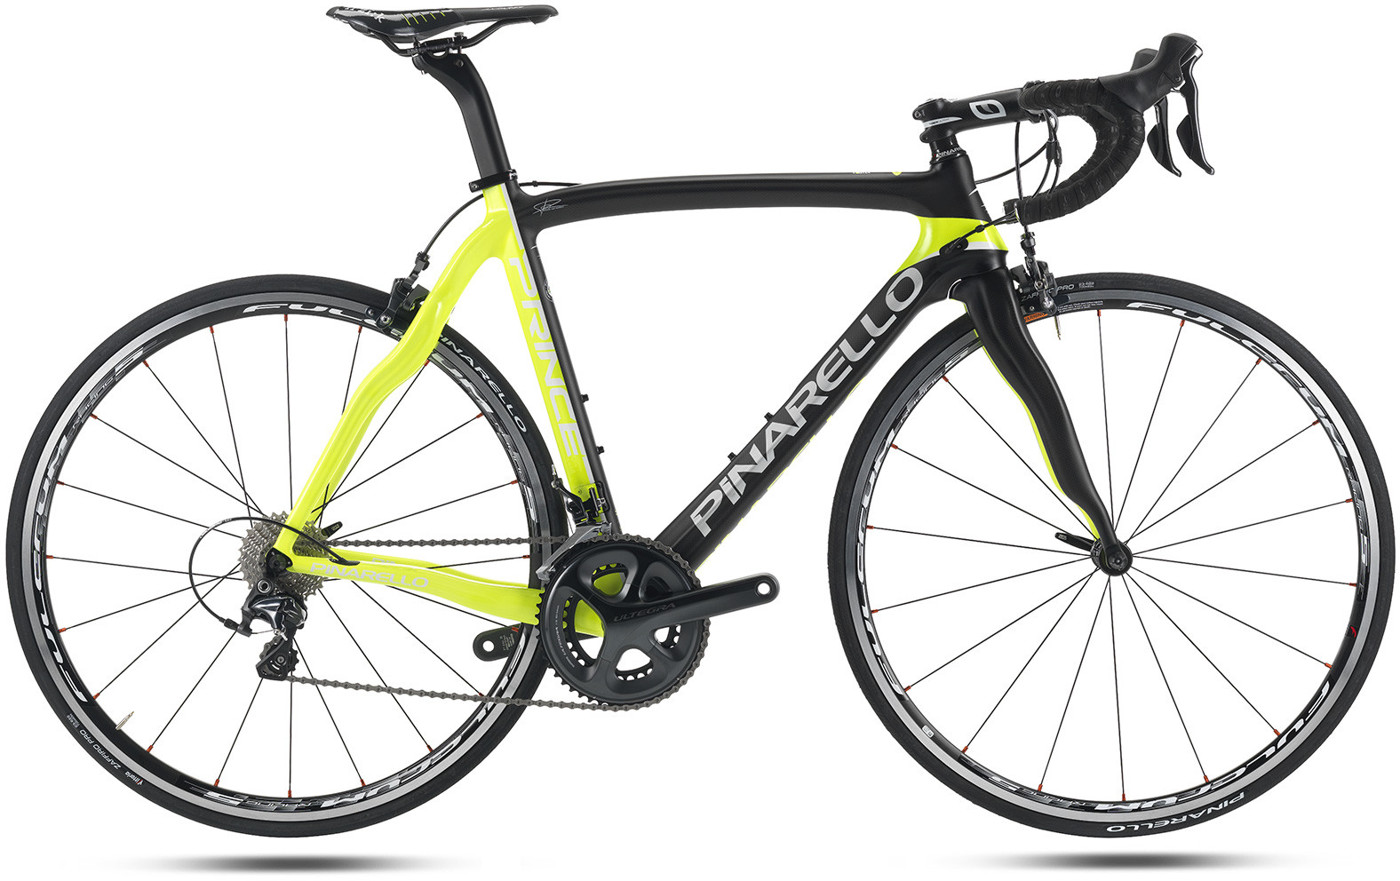 Pinarello PRINCE 60.3 - Carbon Torayca 60HM3K - 256 2016